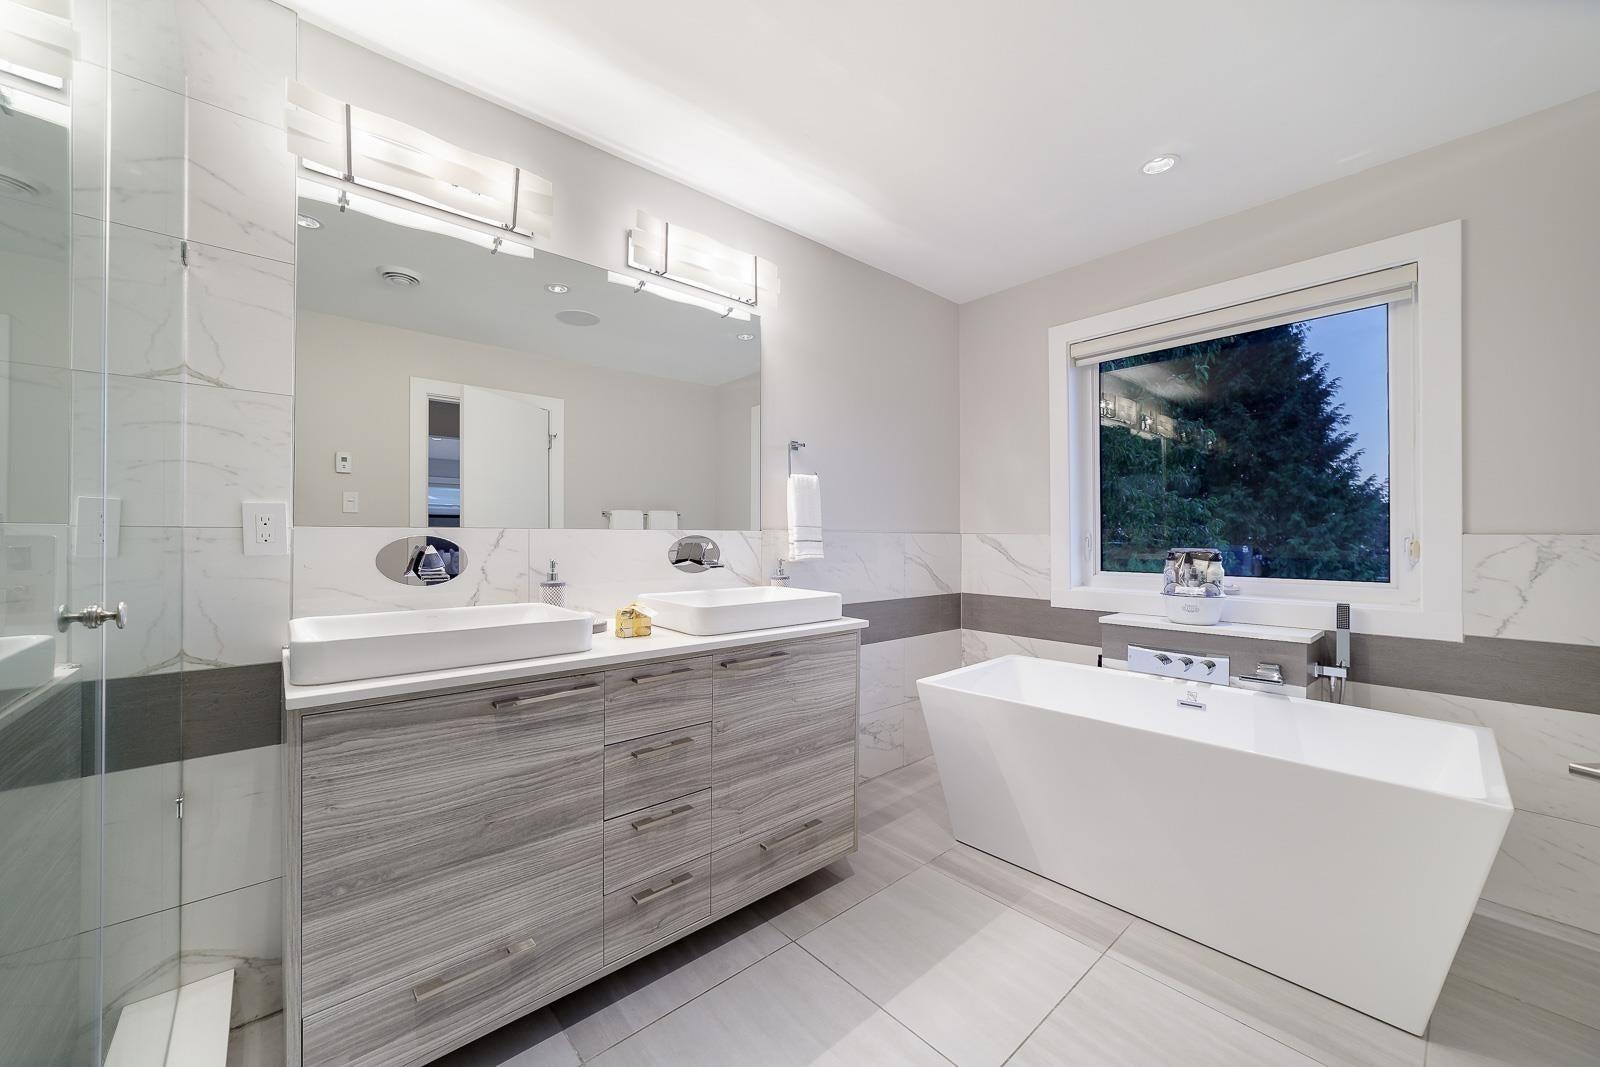 517 GRANADA CRESCENT - Upper Delbrook House/Single Family for sale, 8 Bedrooms (R2615057) - #17